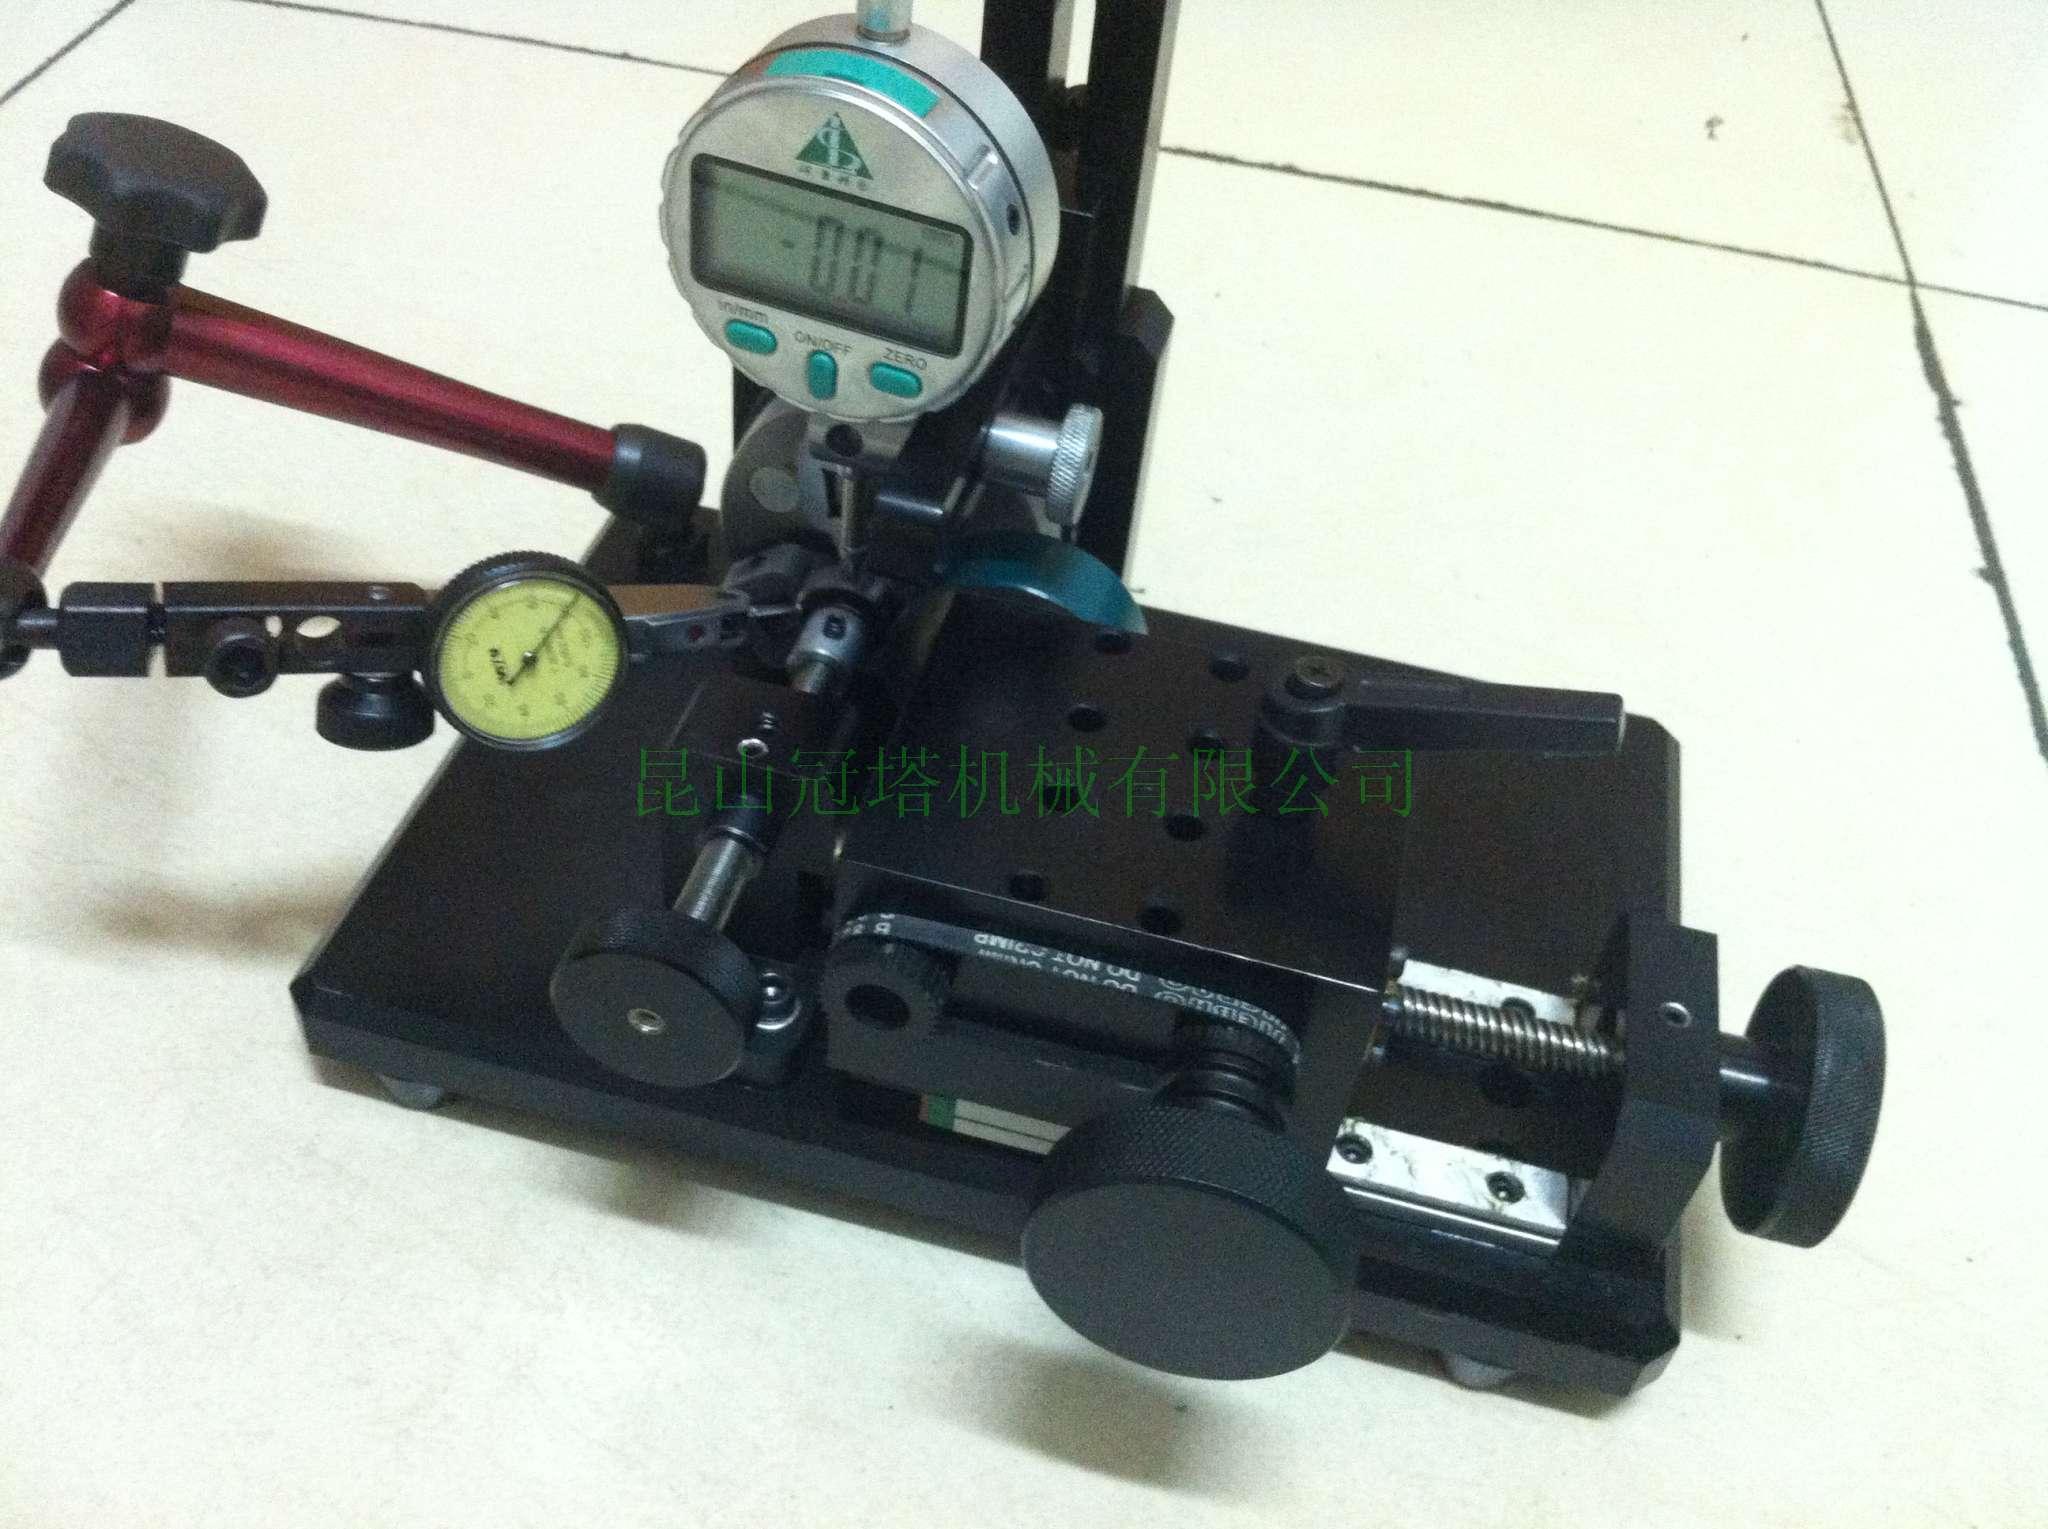 xmta-j巡回检测仪接线图